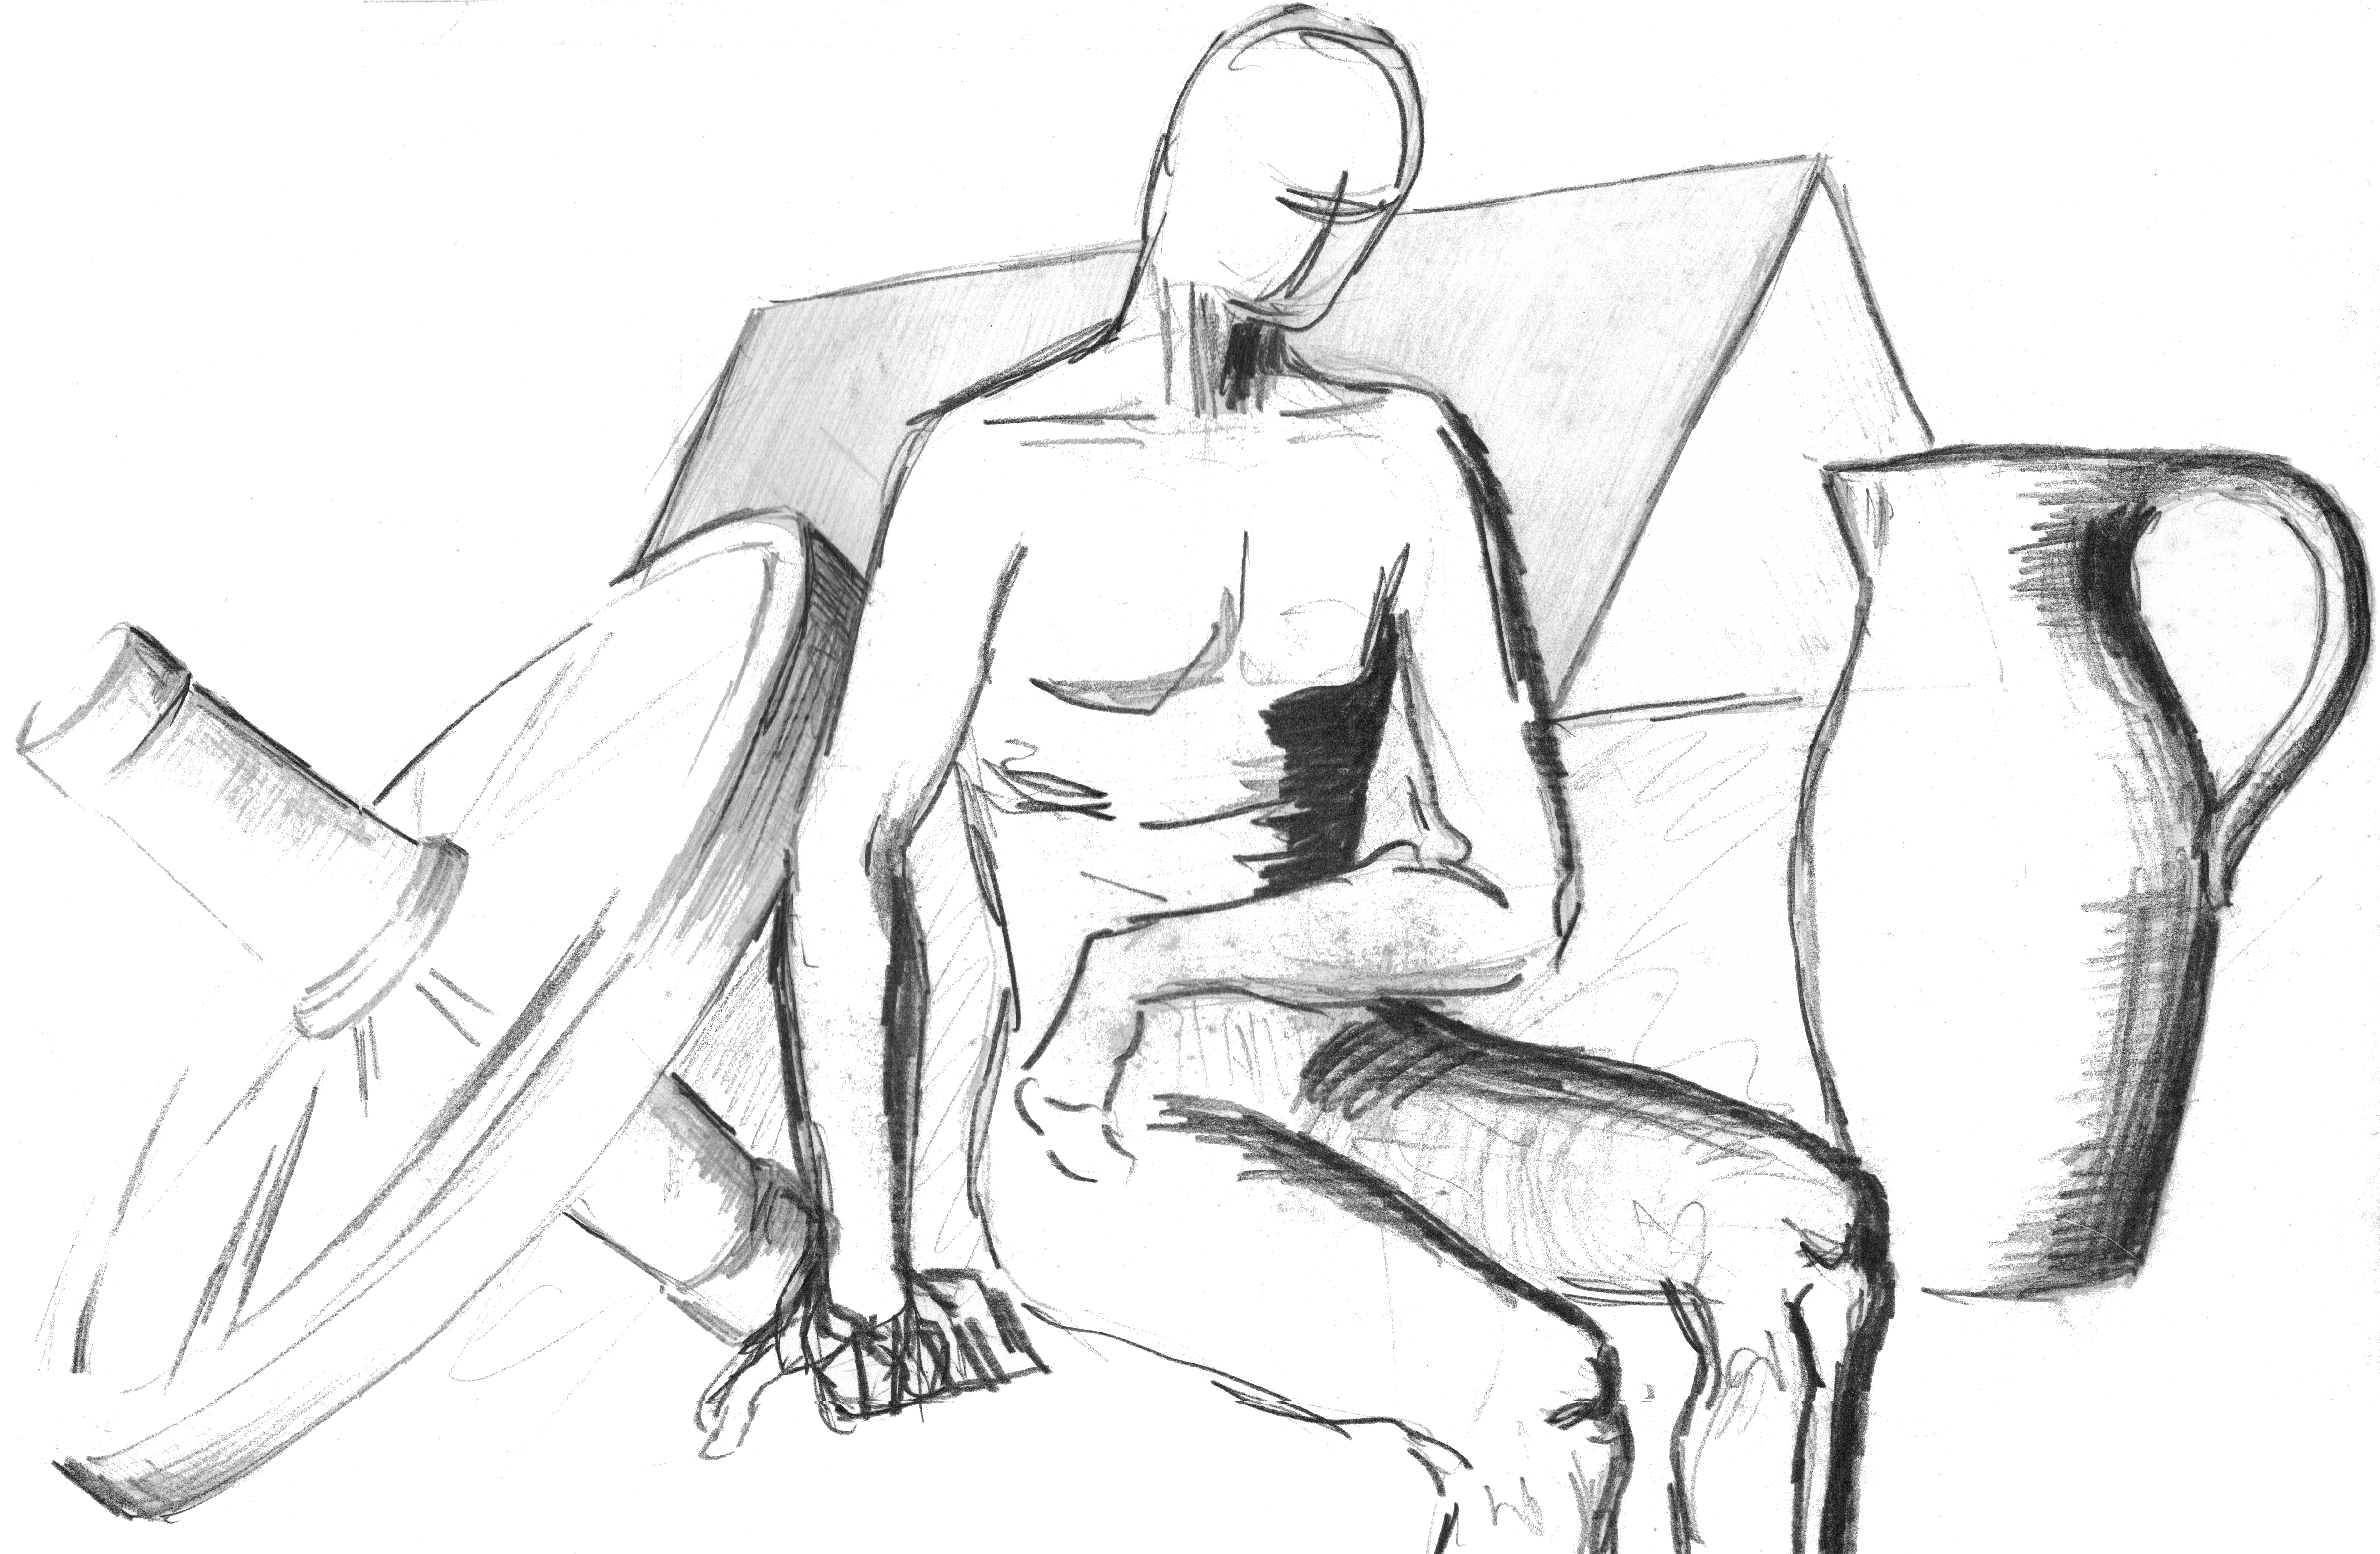 11638x7601 Free Images Man, Black And White, Plane, Sitting, Tent, Artwork